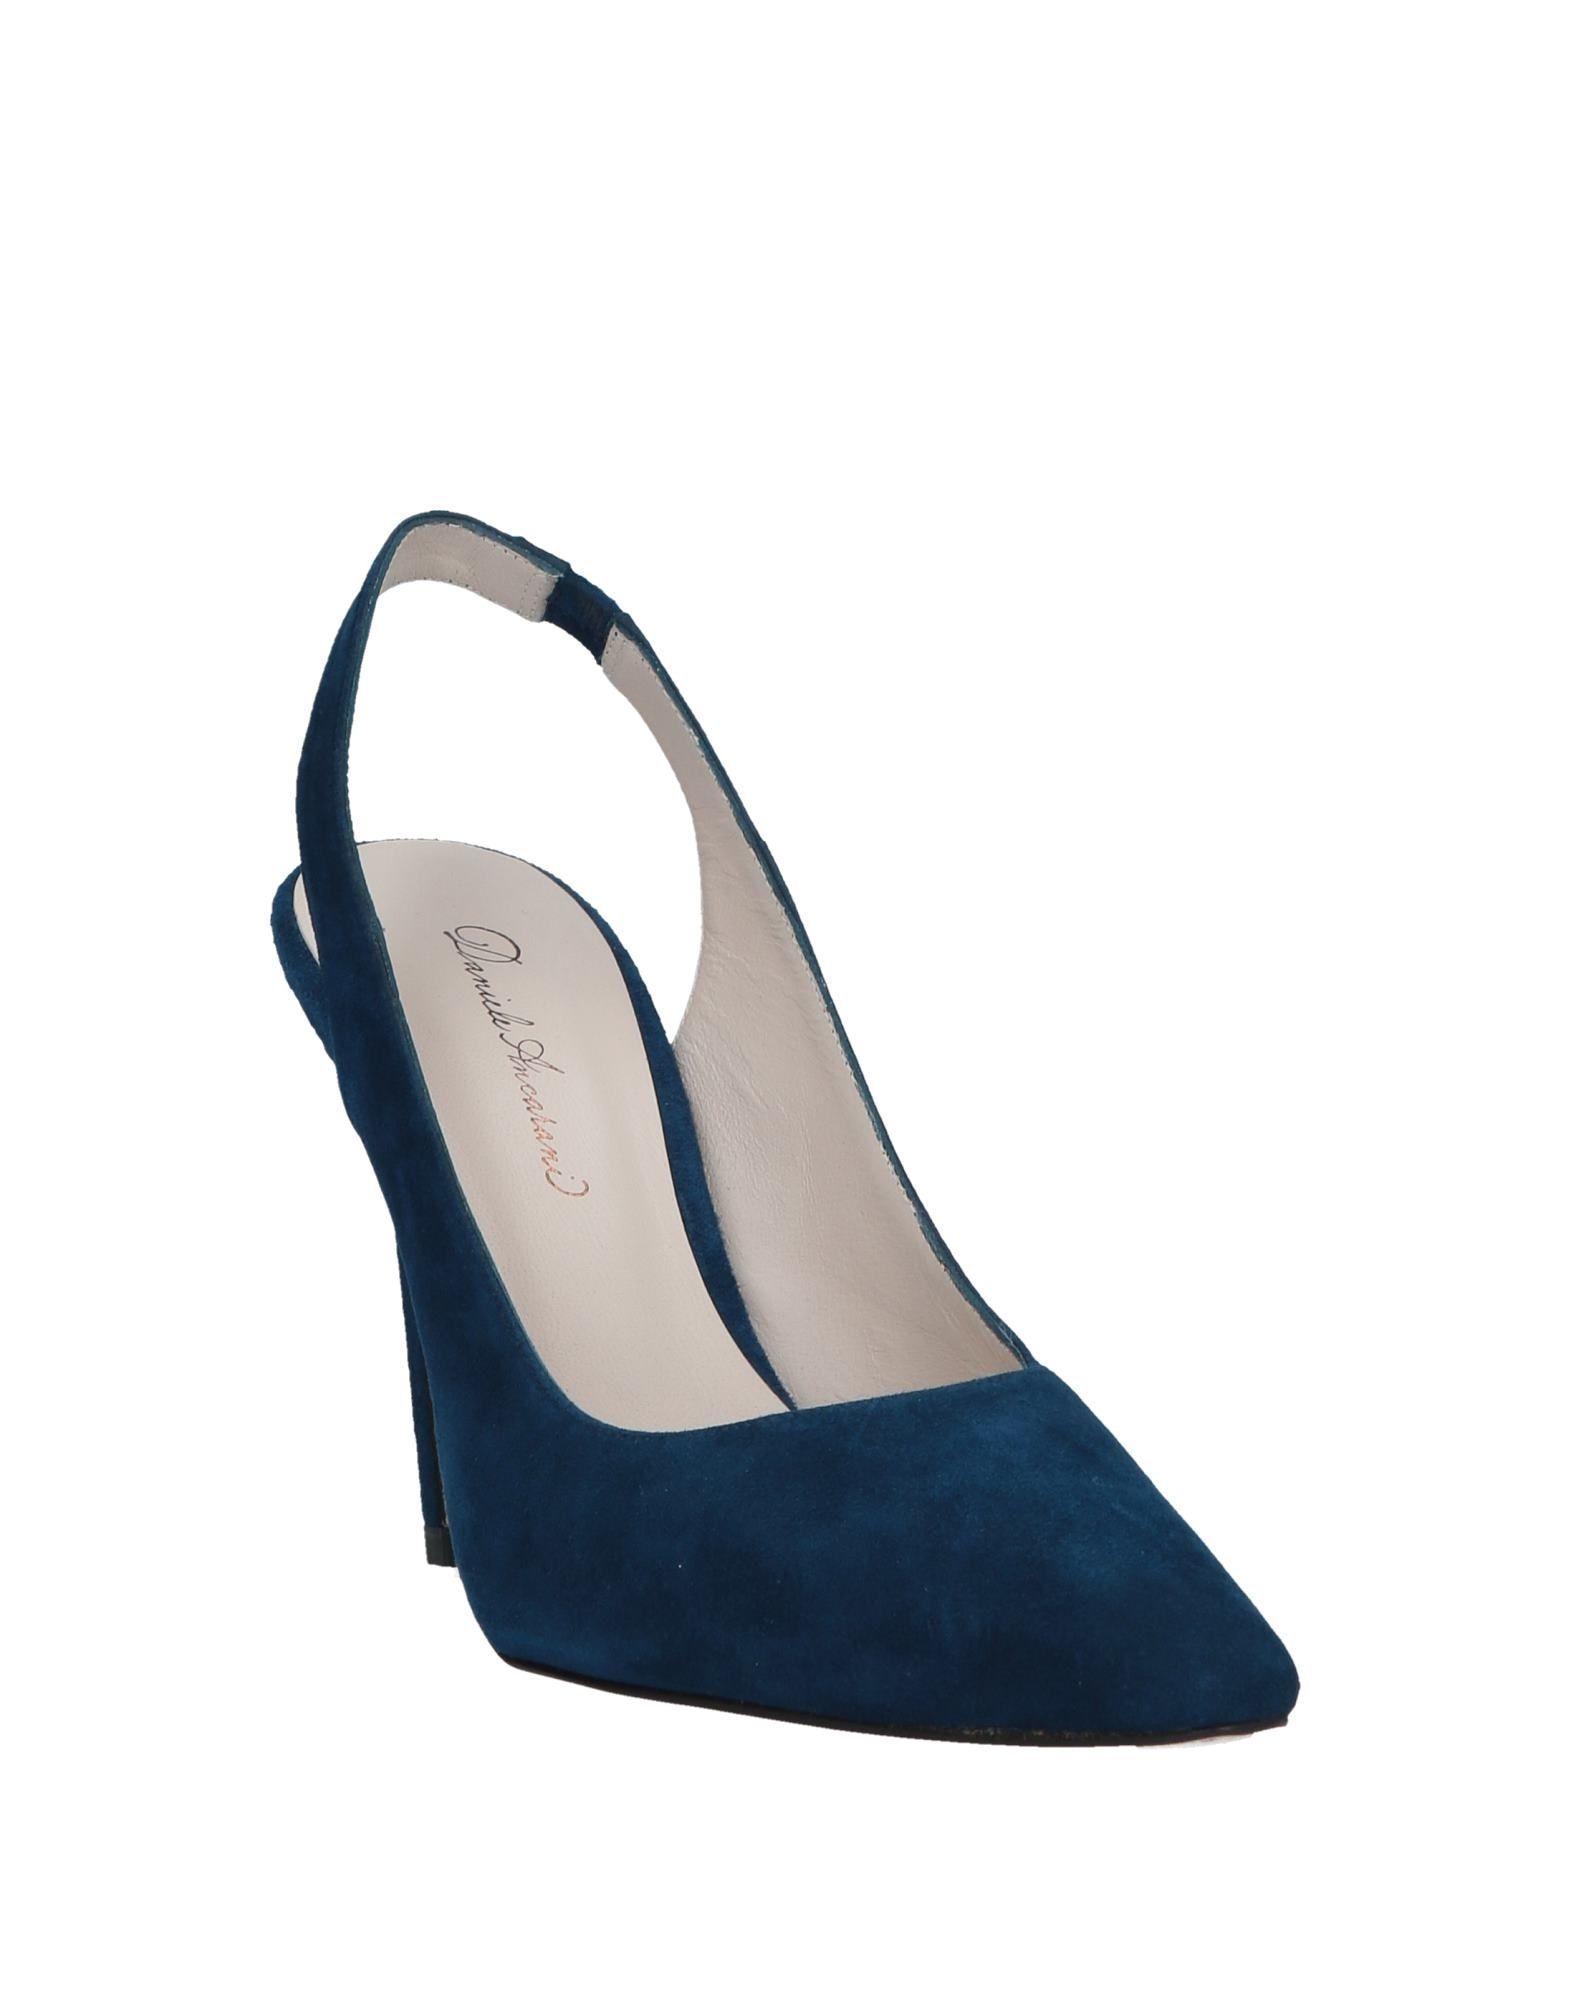 Daniele Ancarani Women's Courts Dark Blue Leather